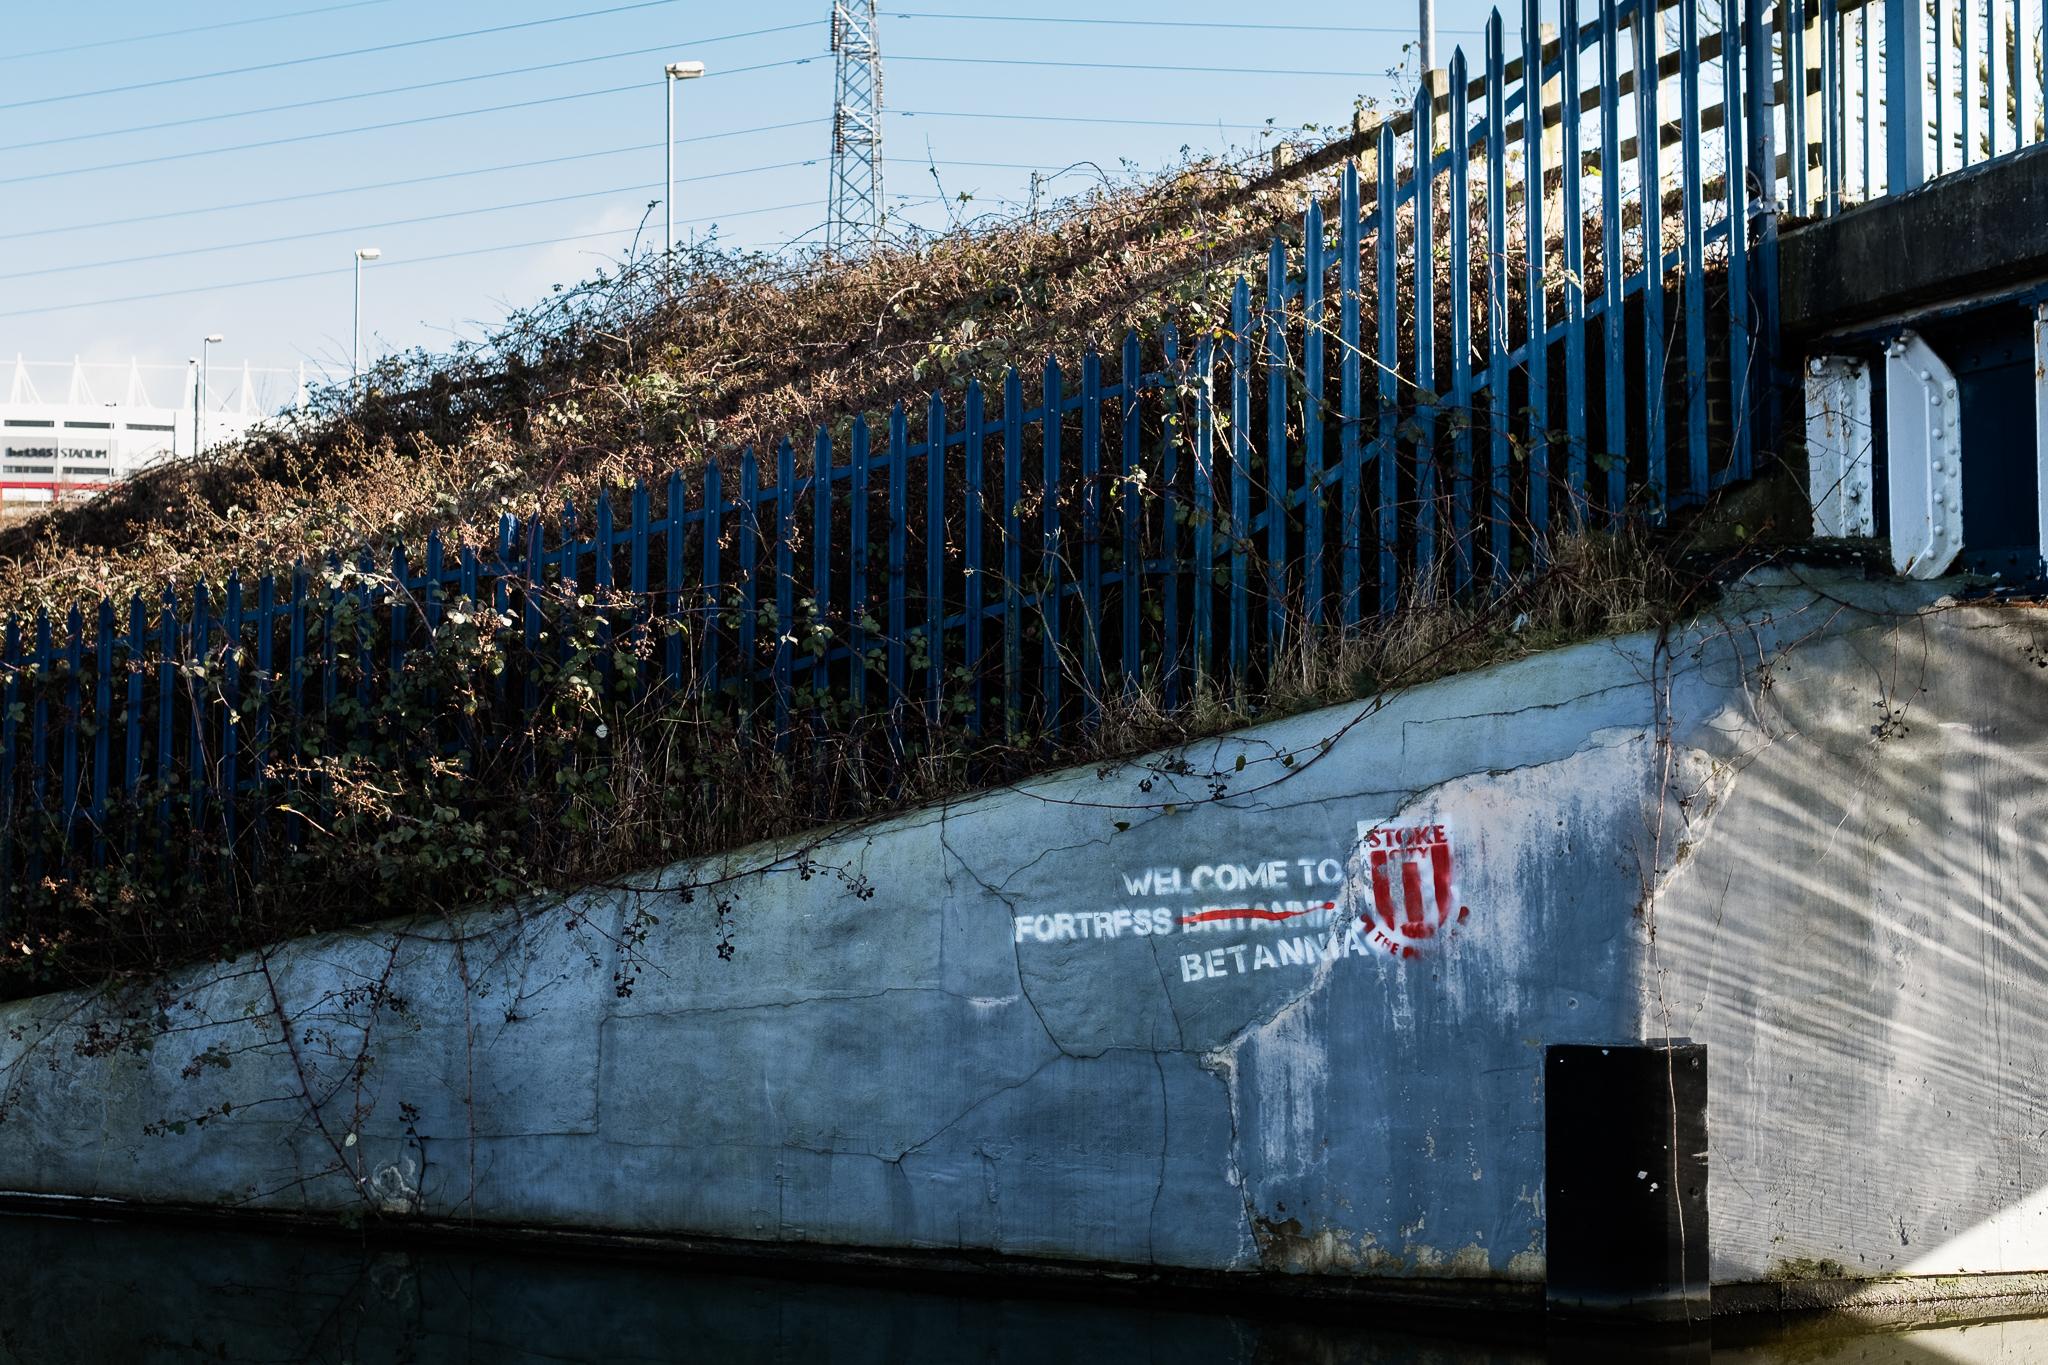 Barlaston Closer to Home Photowalk Britannia Stadium Stanley Matthews Way Canal-17.jpg